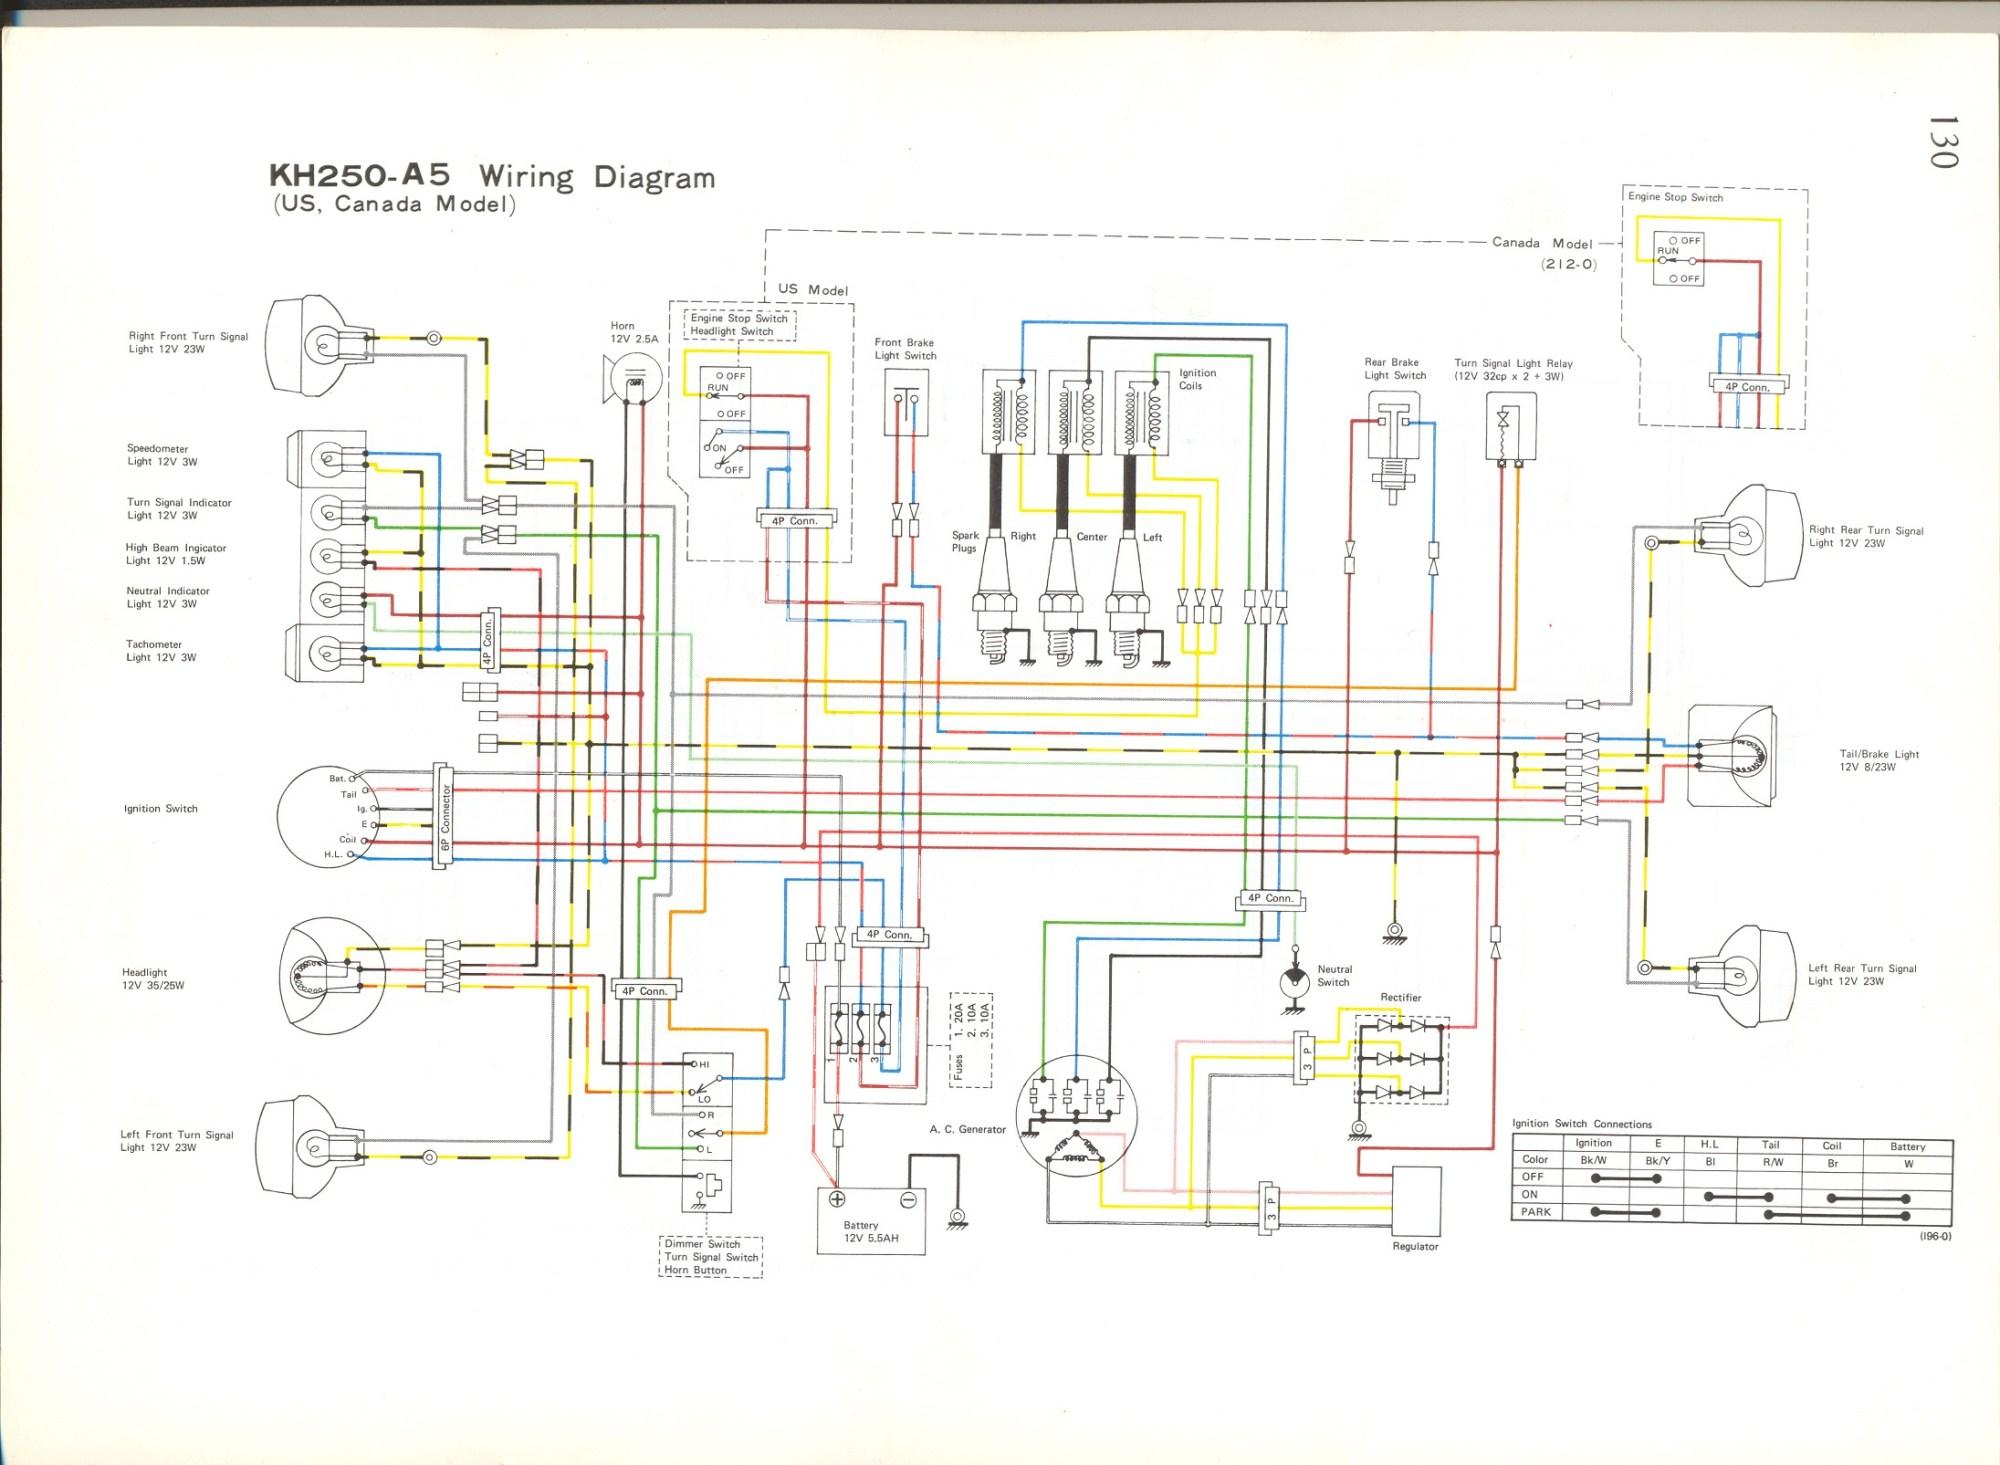 hight resolution of suzuki x4 motorcycle wiring diagram wiring diagram and motorcycle wiring harness diagram electrical